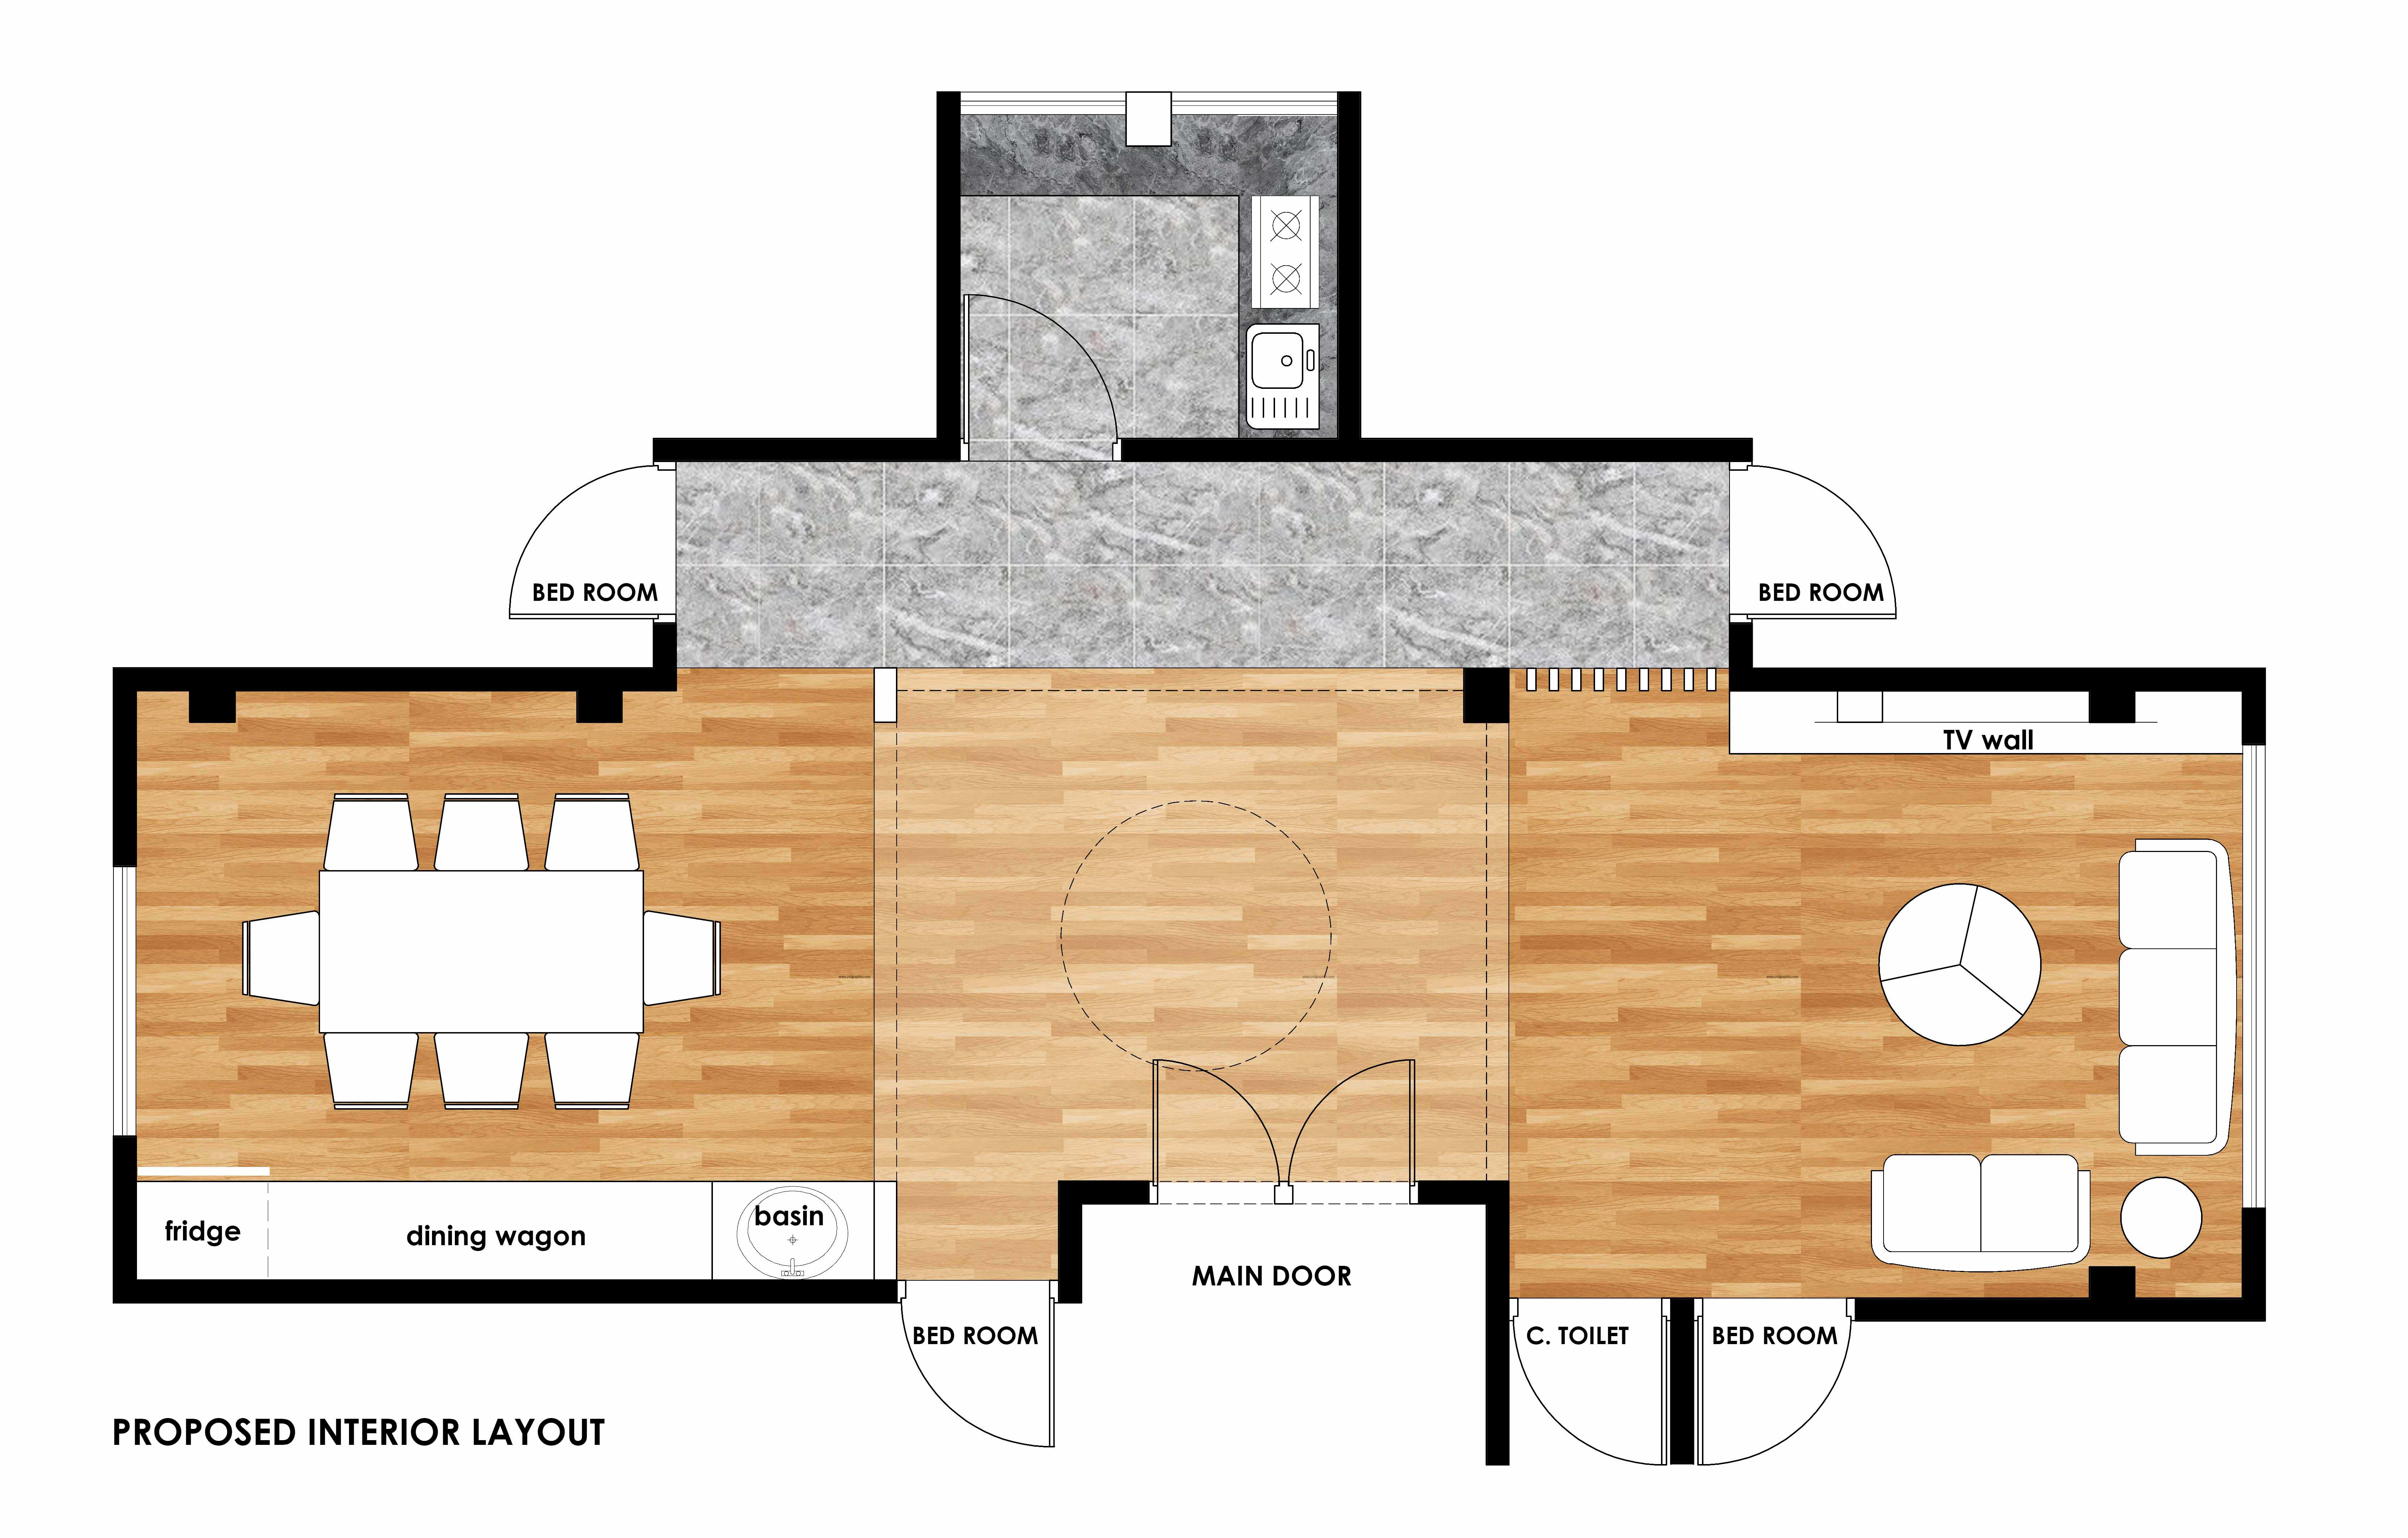 Render Floor Plan In Autocad Then Photoshop Or Corel Draw By Arslan Germany Fiverr